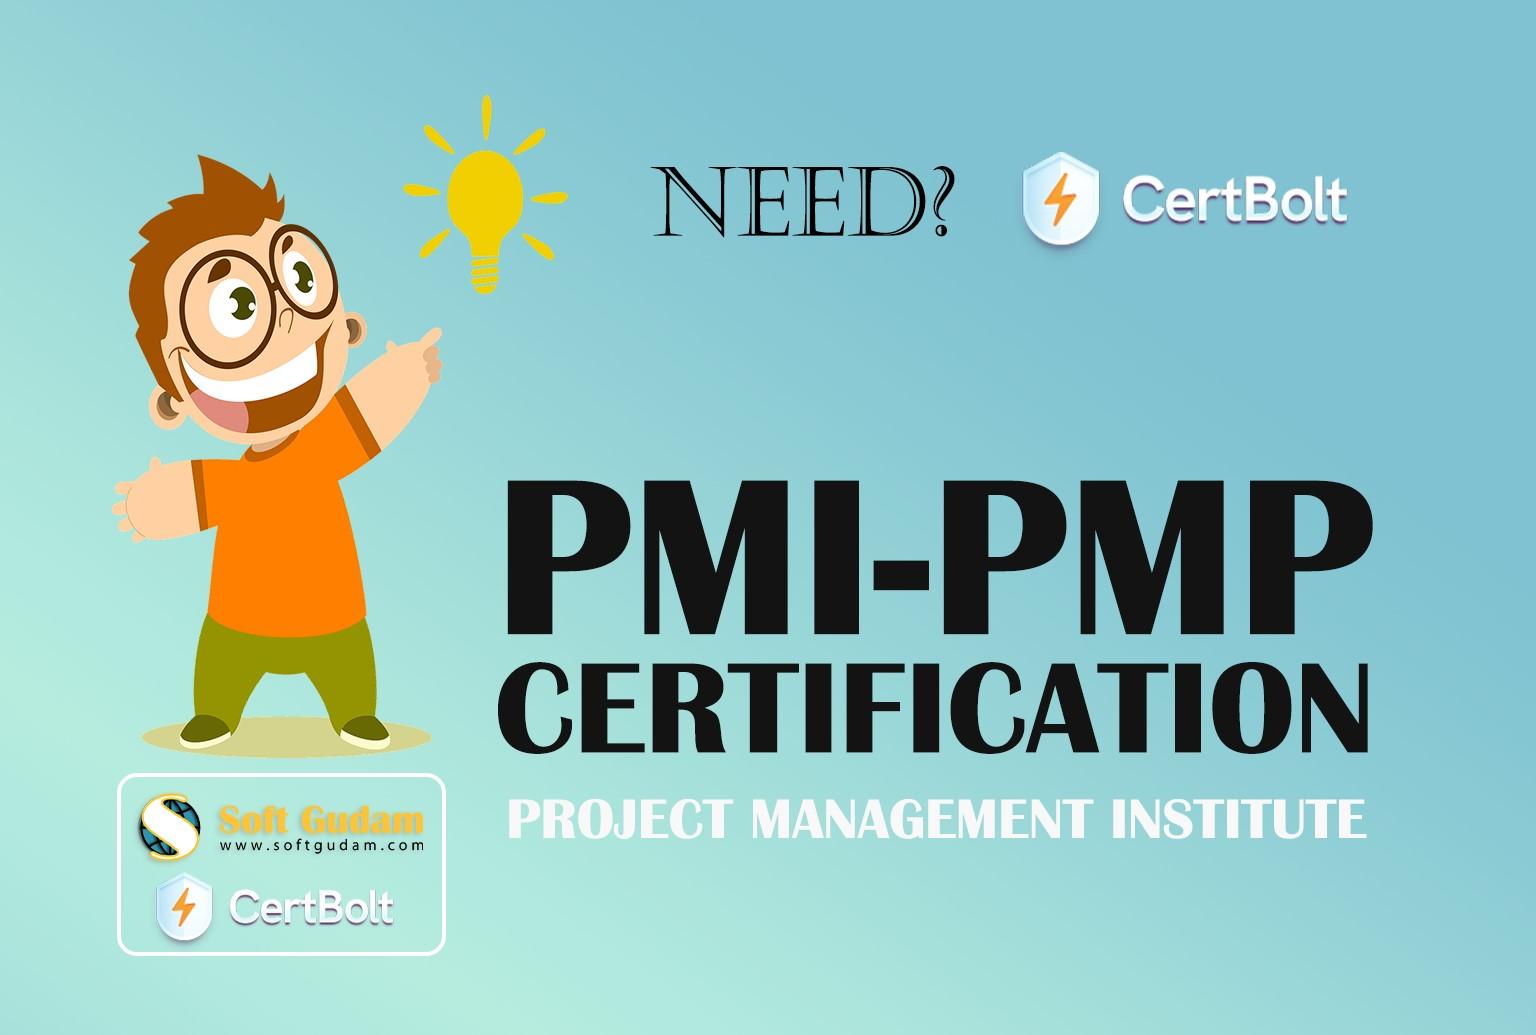 PMI PMP Certification